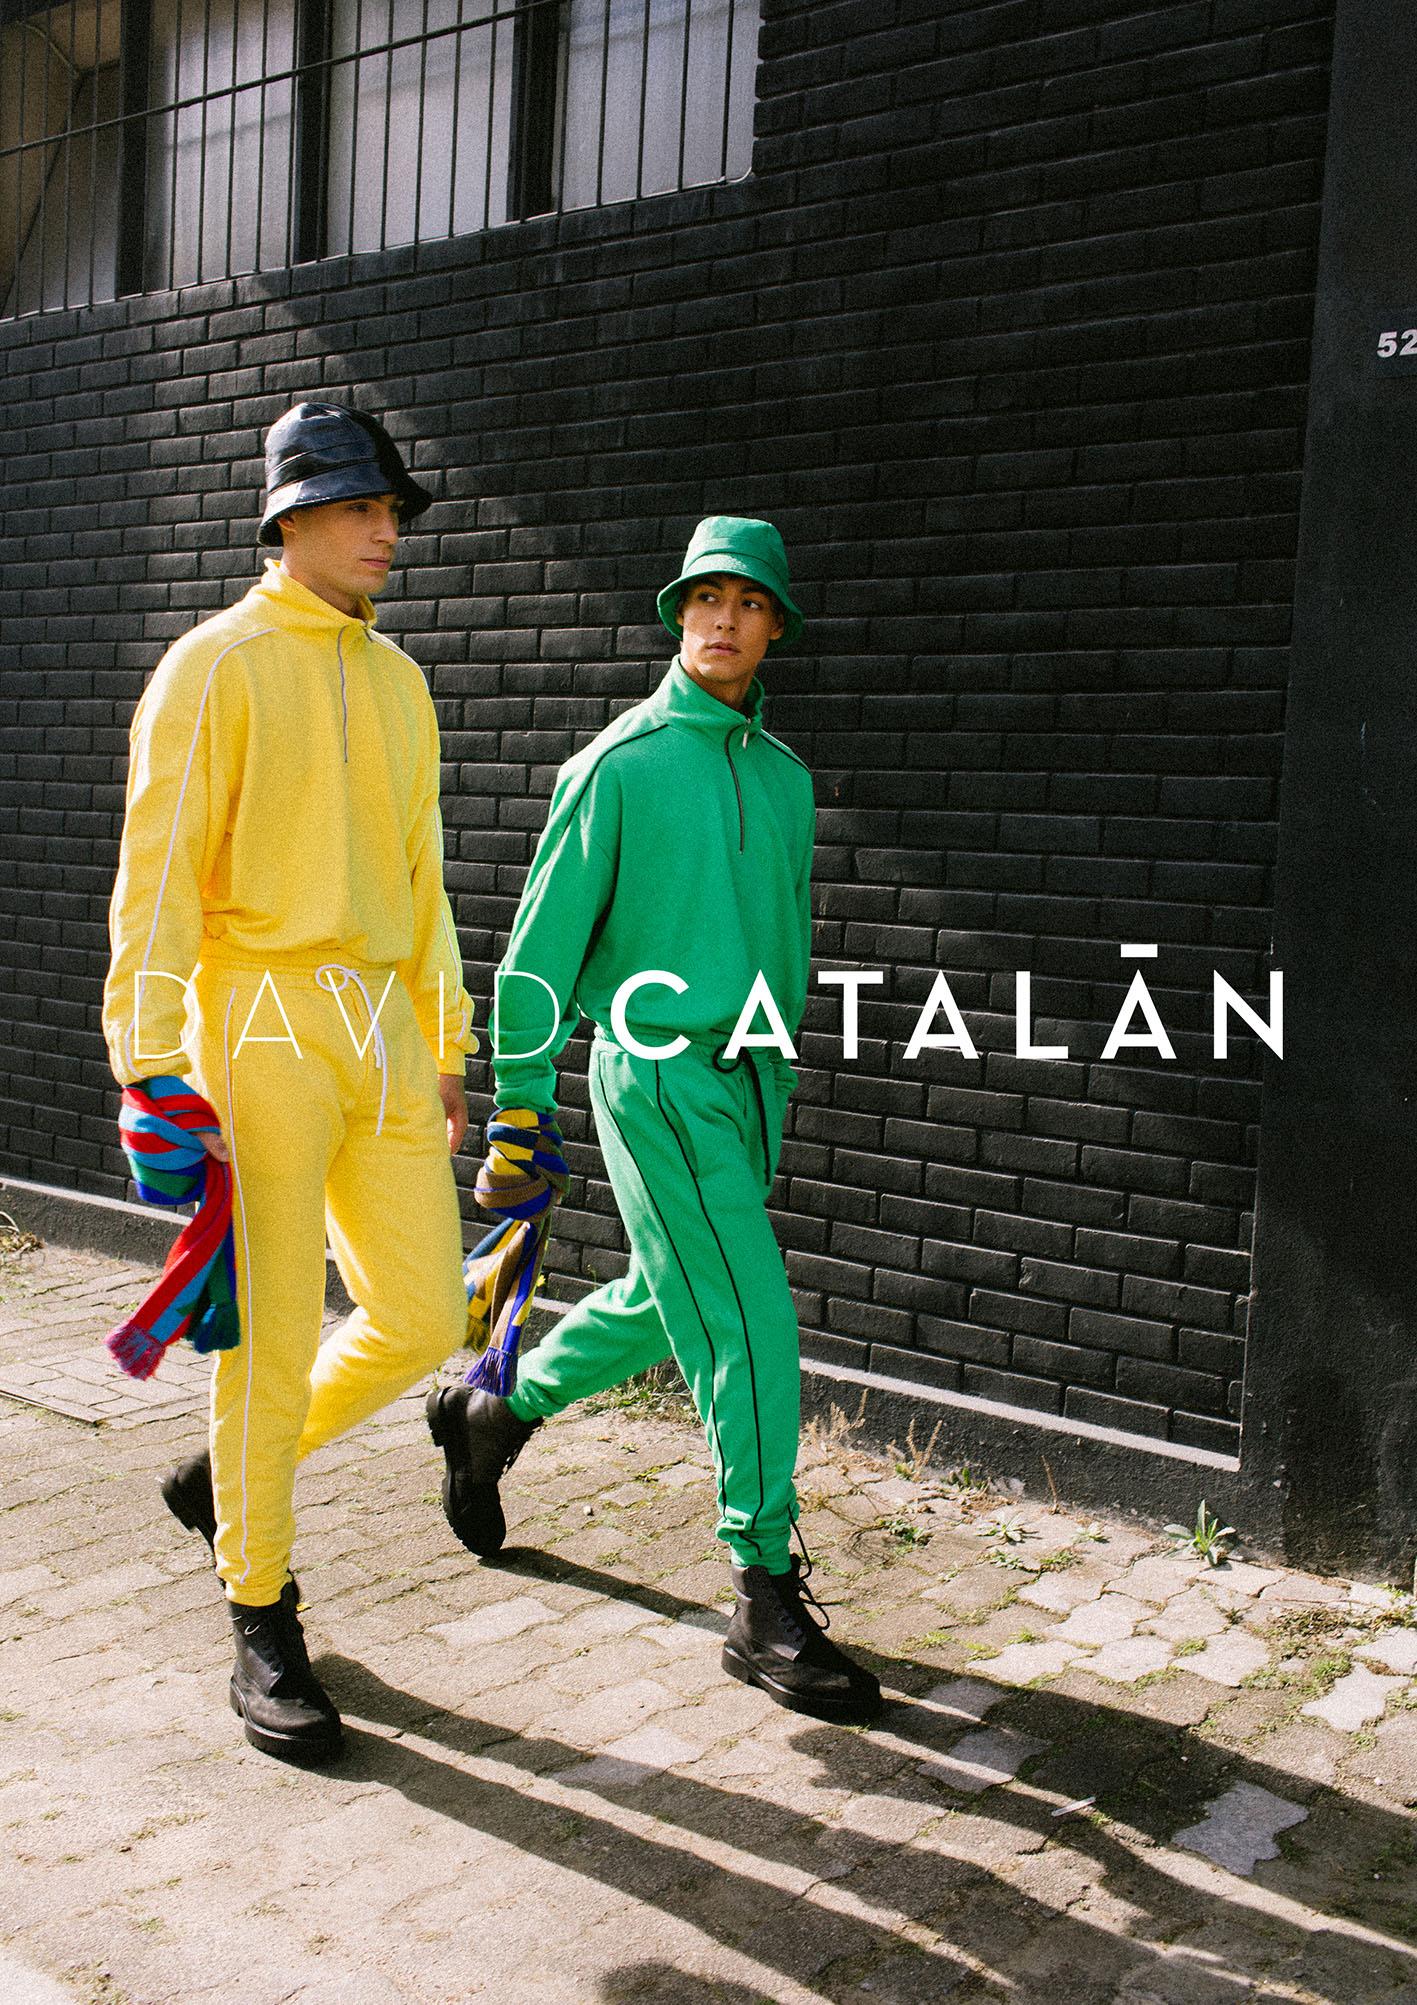 David Catalán FW20